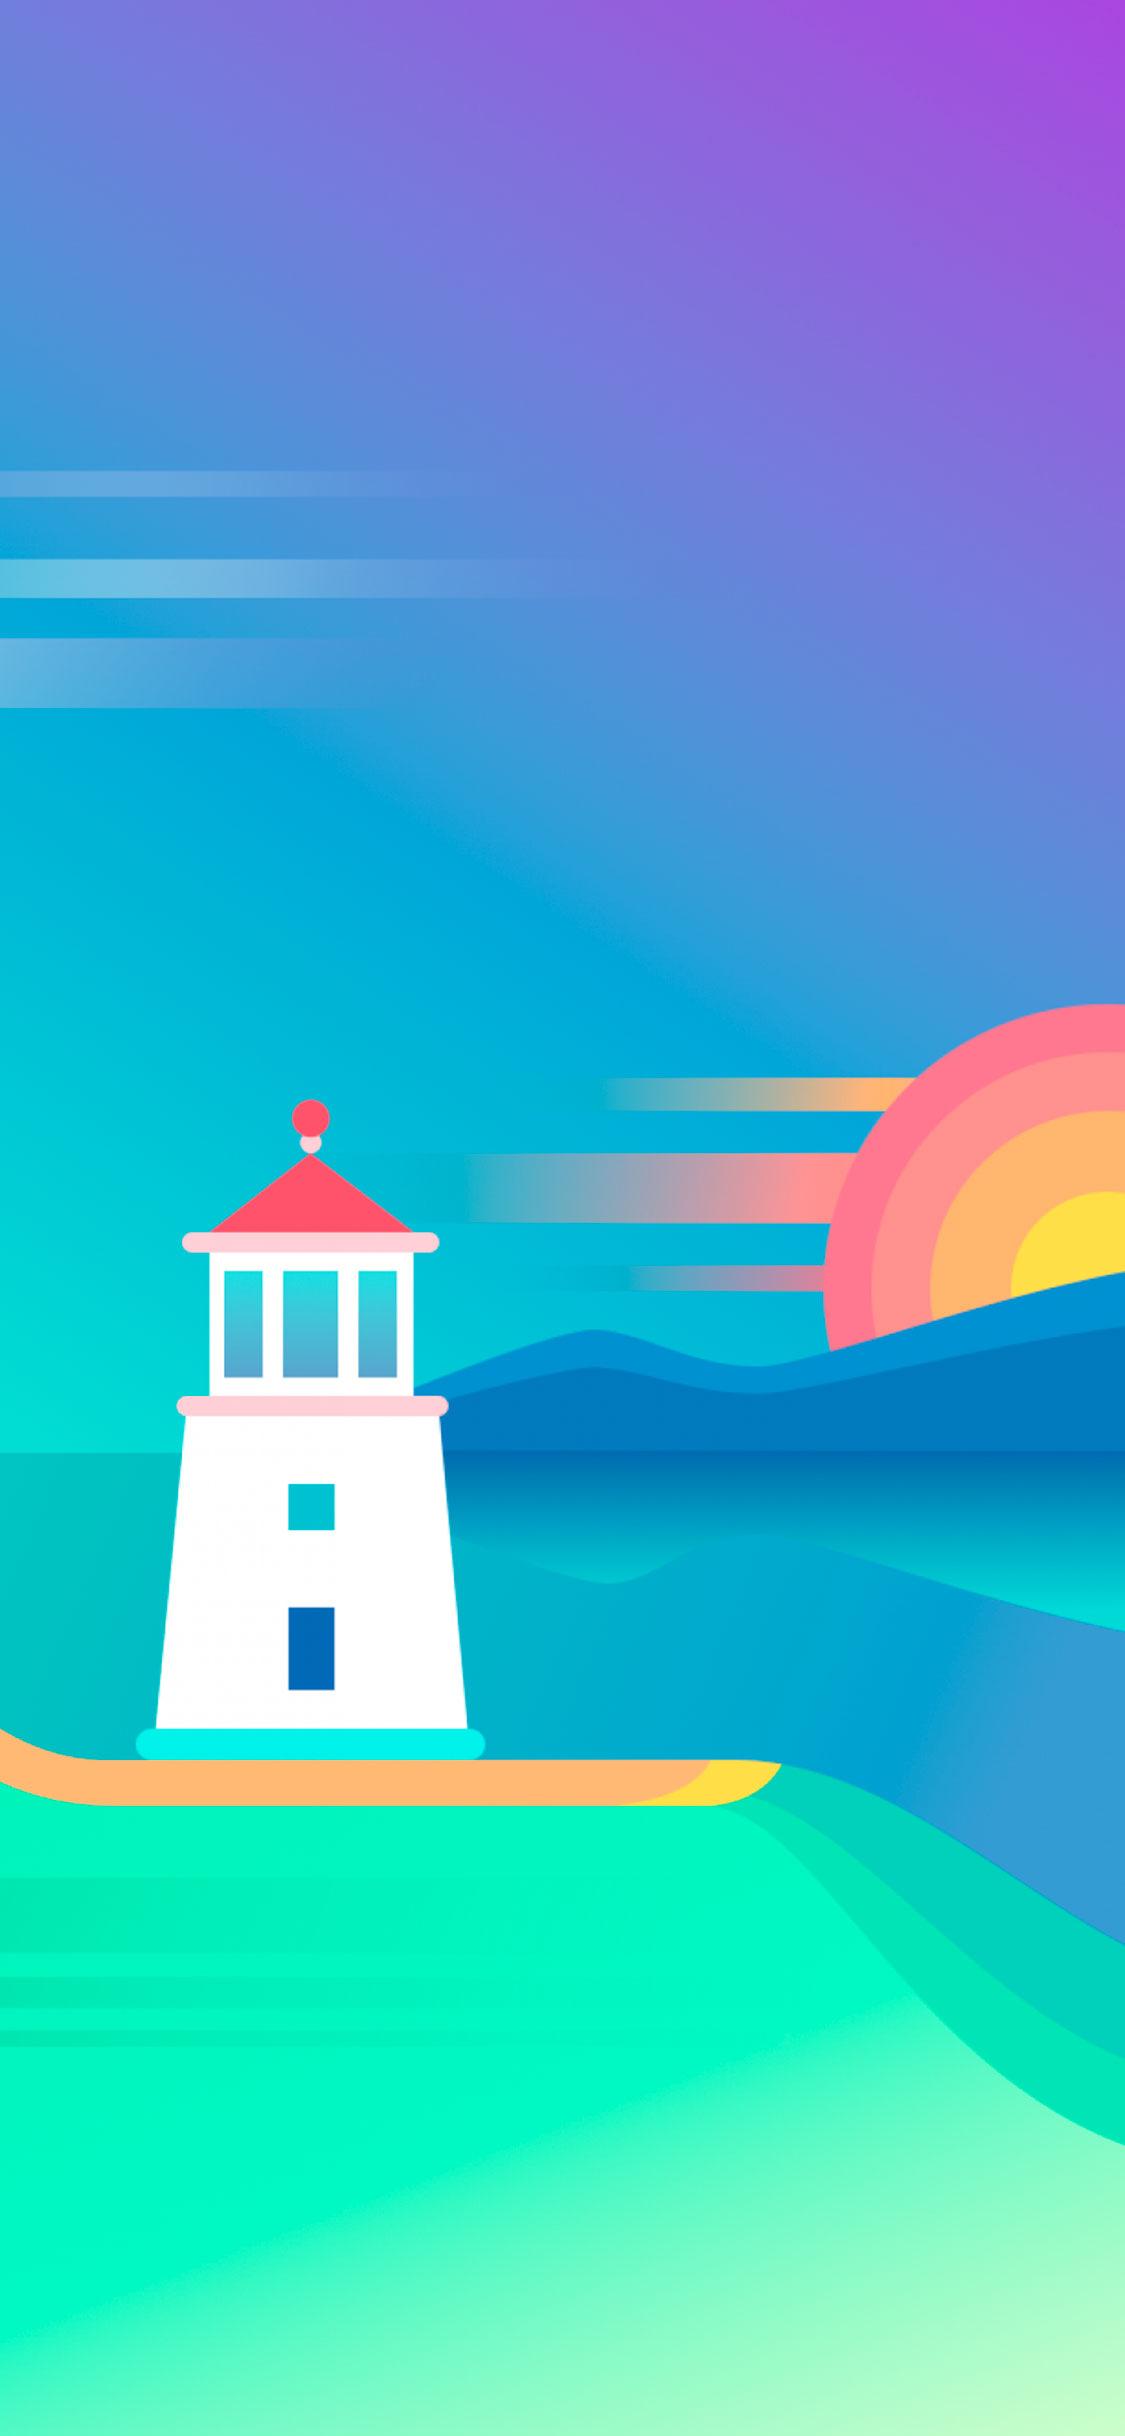 iPhone wallpaper illustration lighthouse Illustration